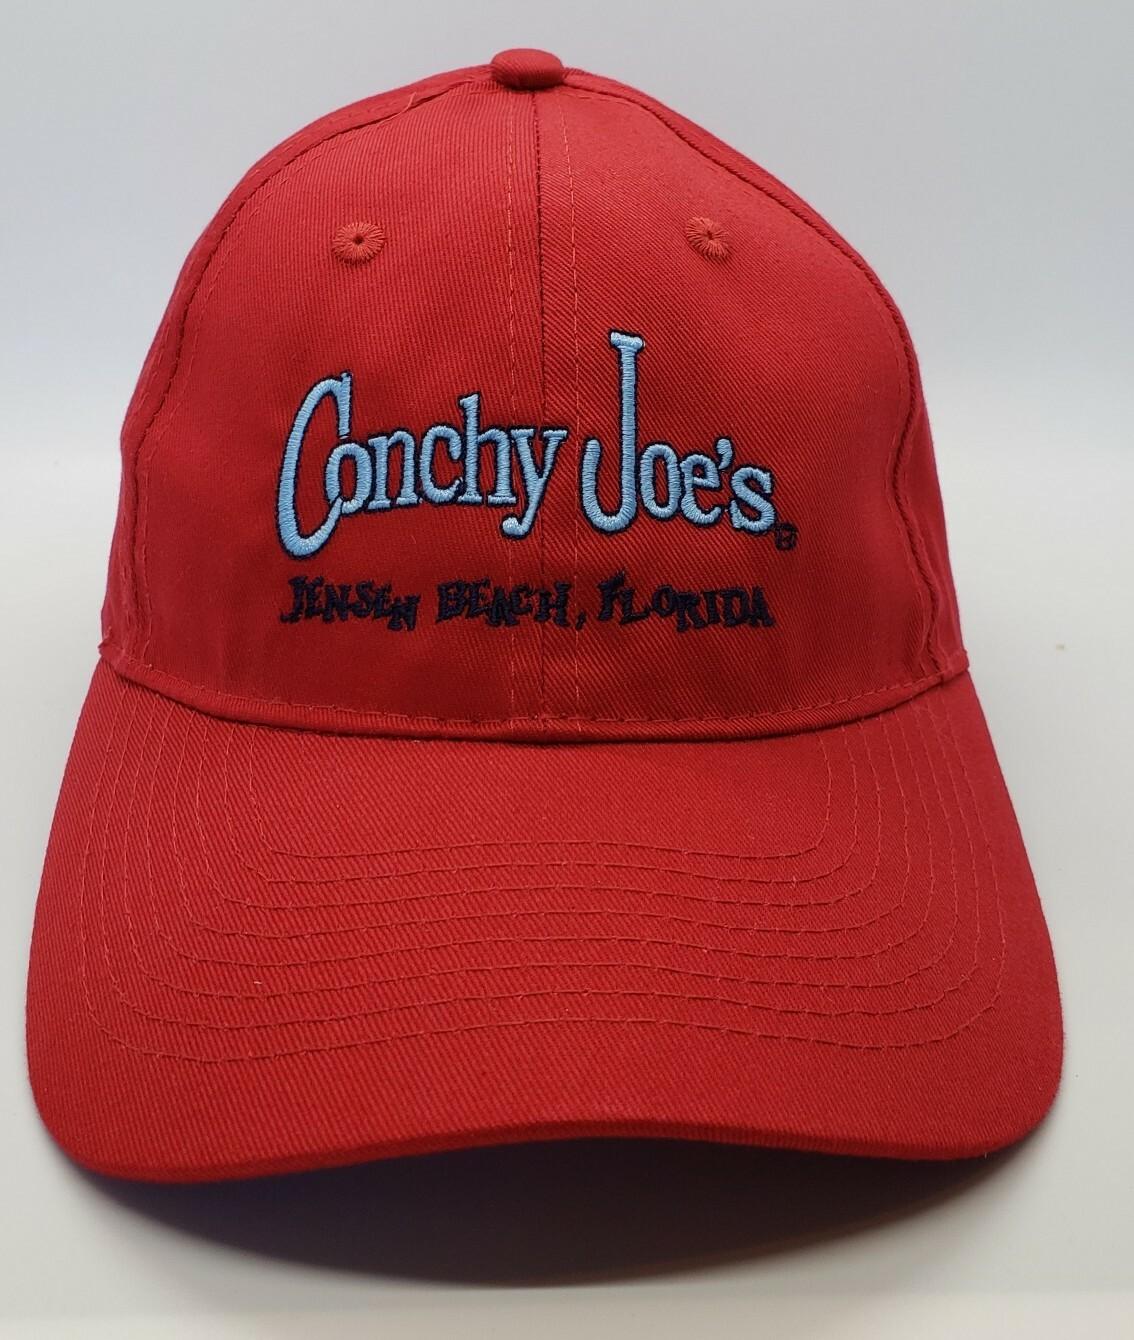 Cj's Red Adjustable Baseball Cap CJ-Red-Hat